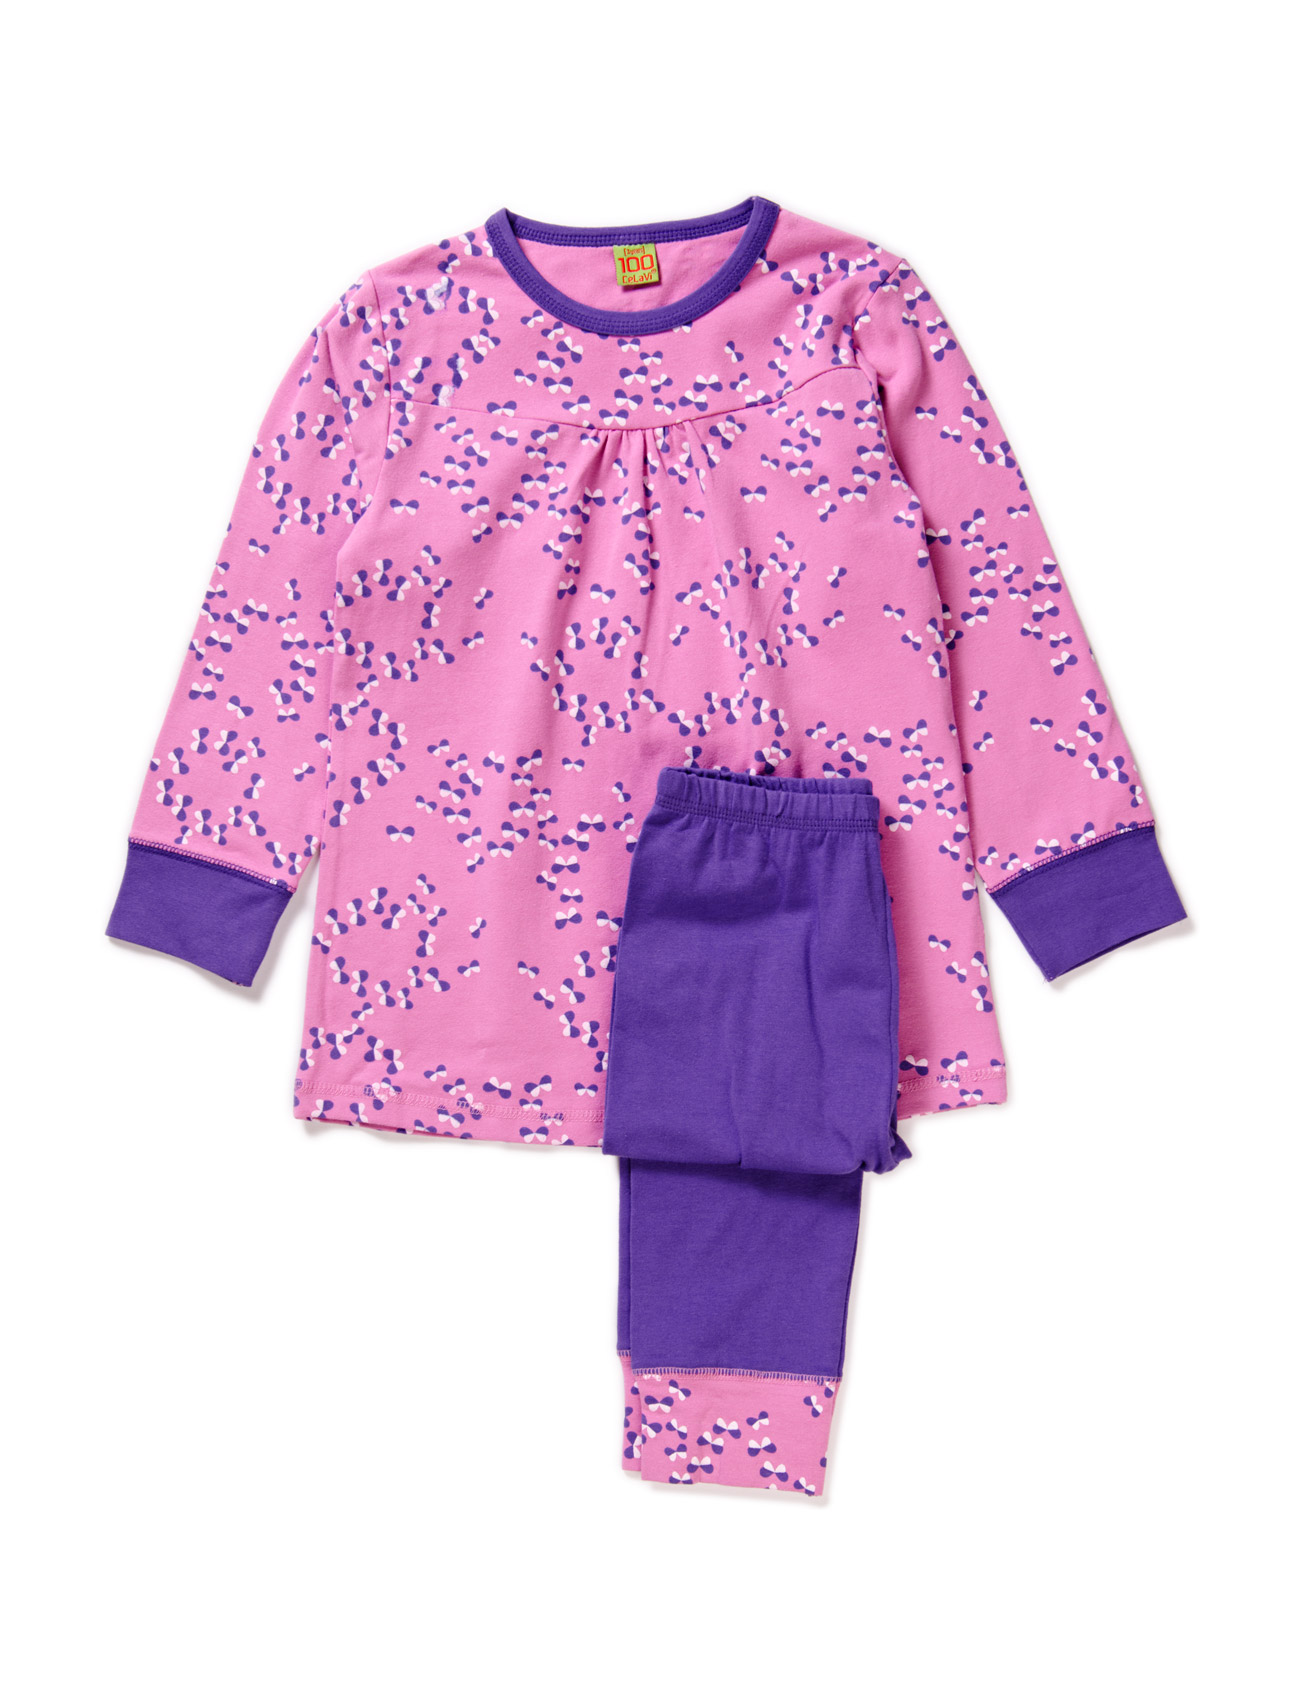 Pyjamas With Butterflies